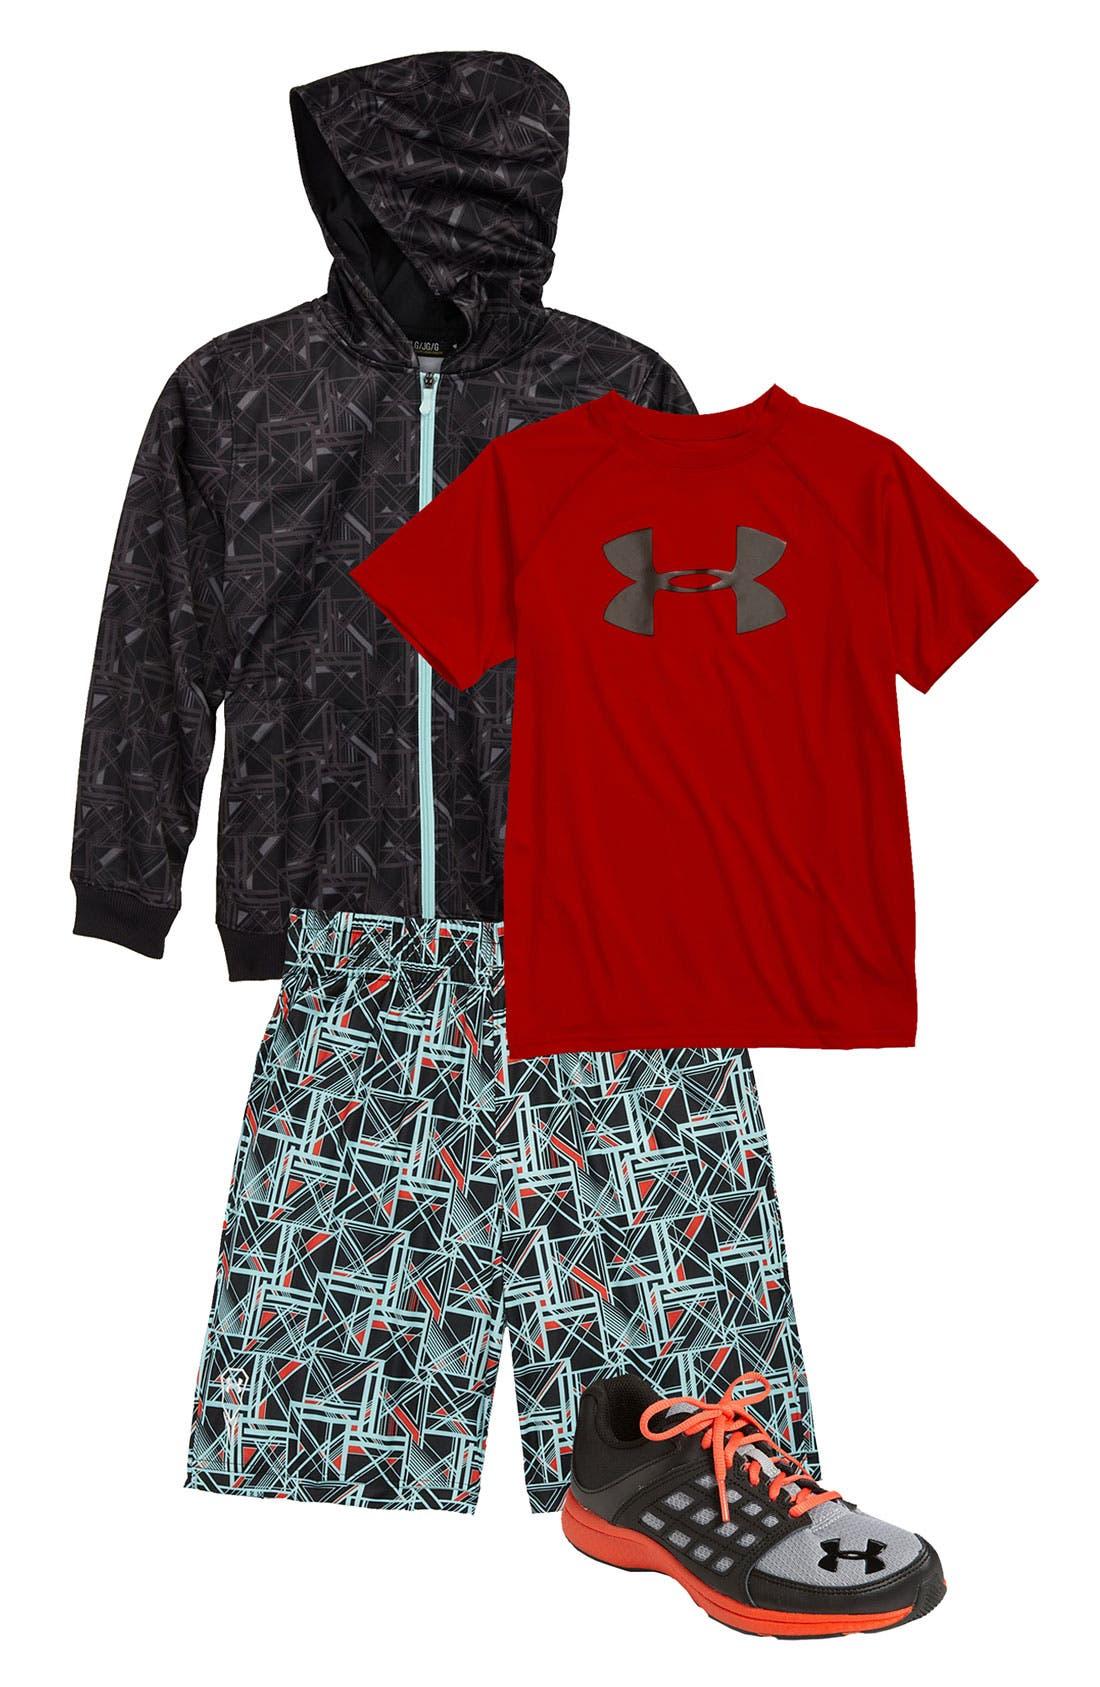 Main Image - Under Armour T-Shirt, Shorts & Hoodie (Big Boys)